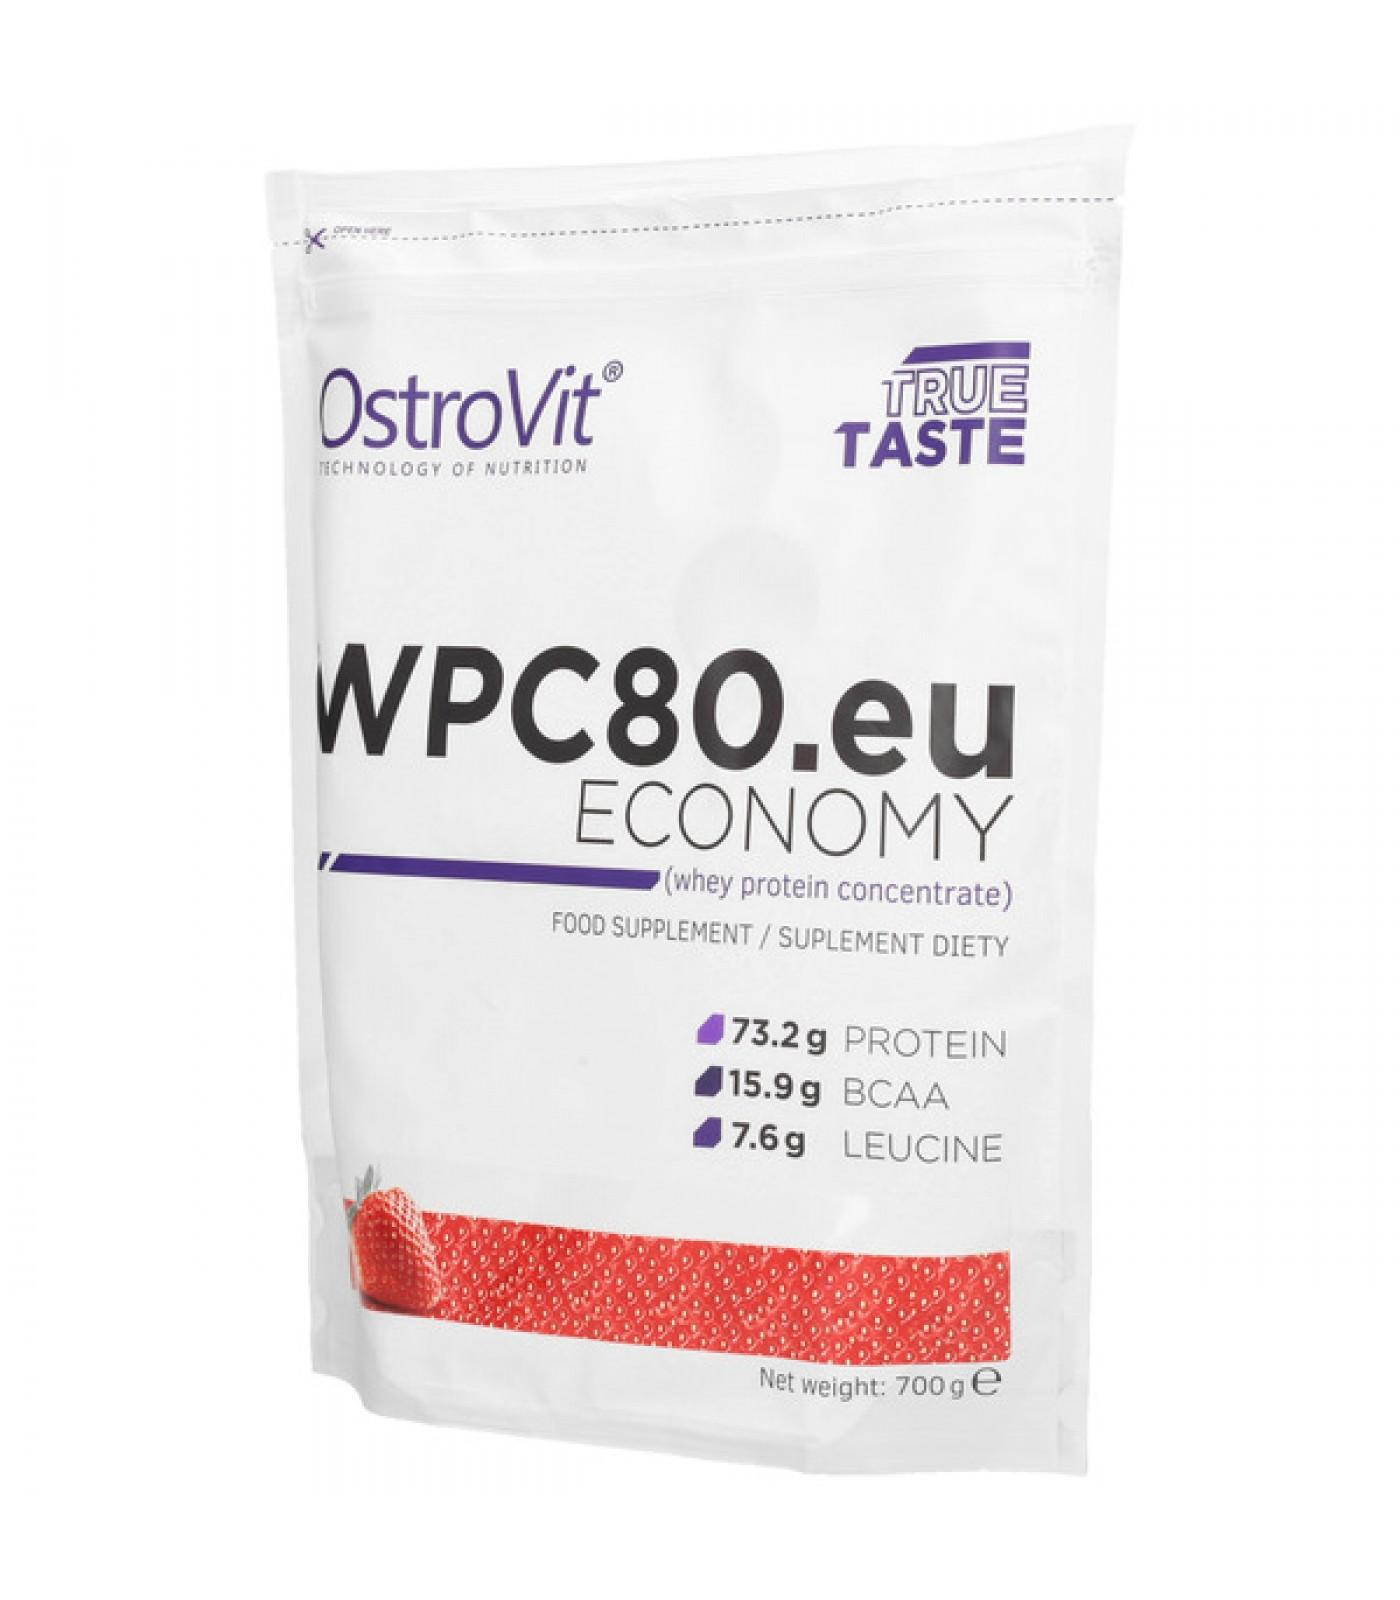 OstroVit - Economy WPC80.eu / 700 g